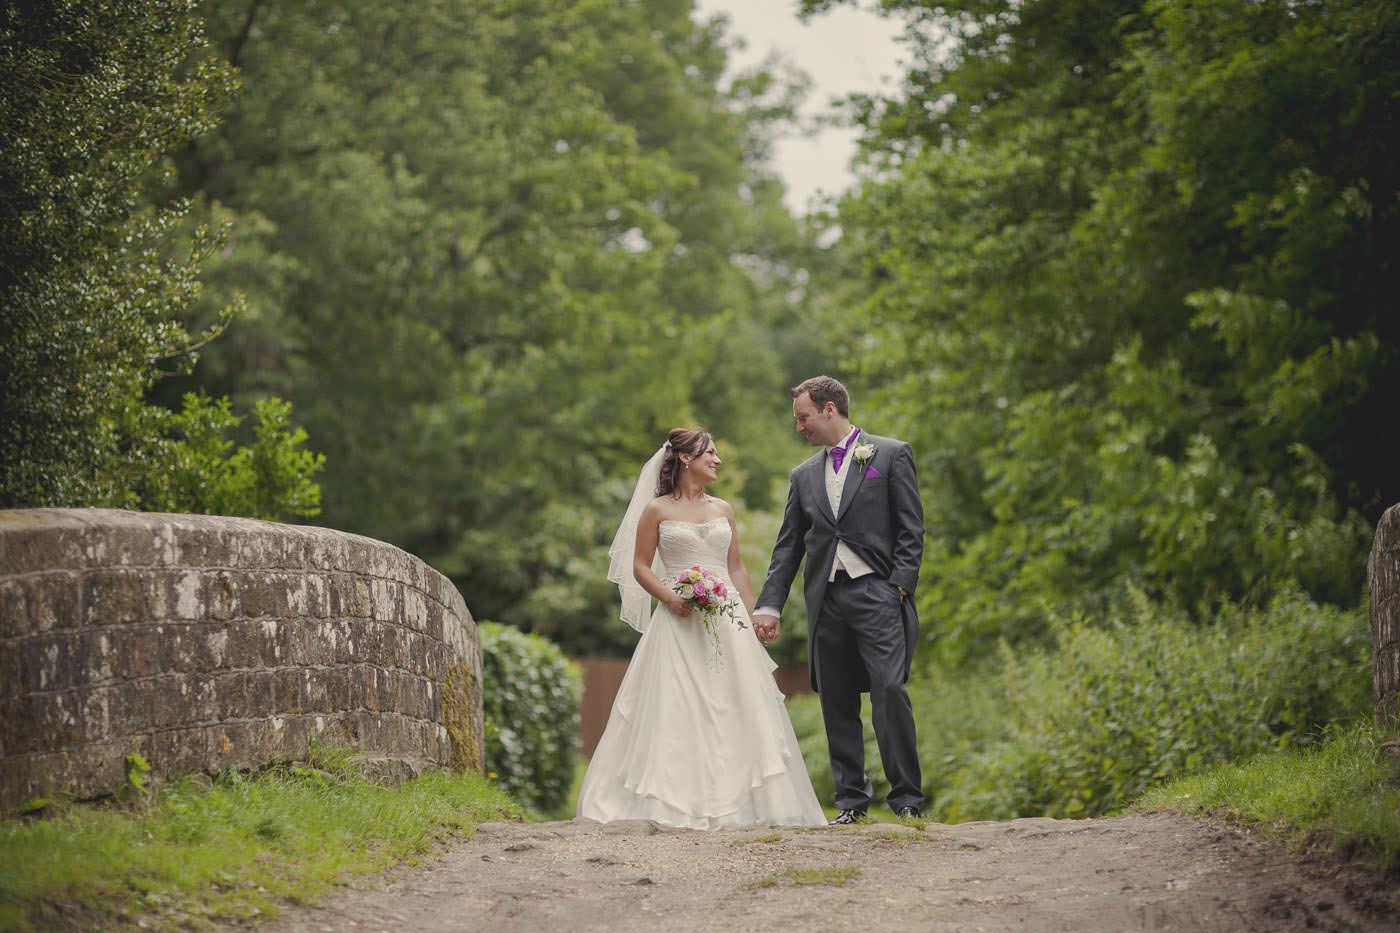 chrissarah walled garden midhurst wedding photographer 0078